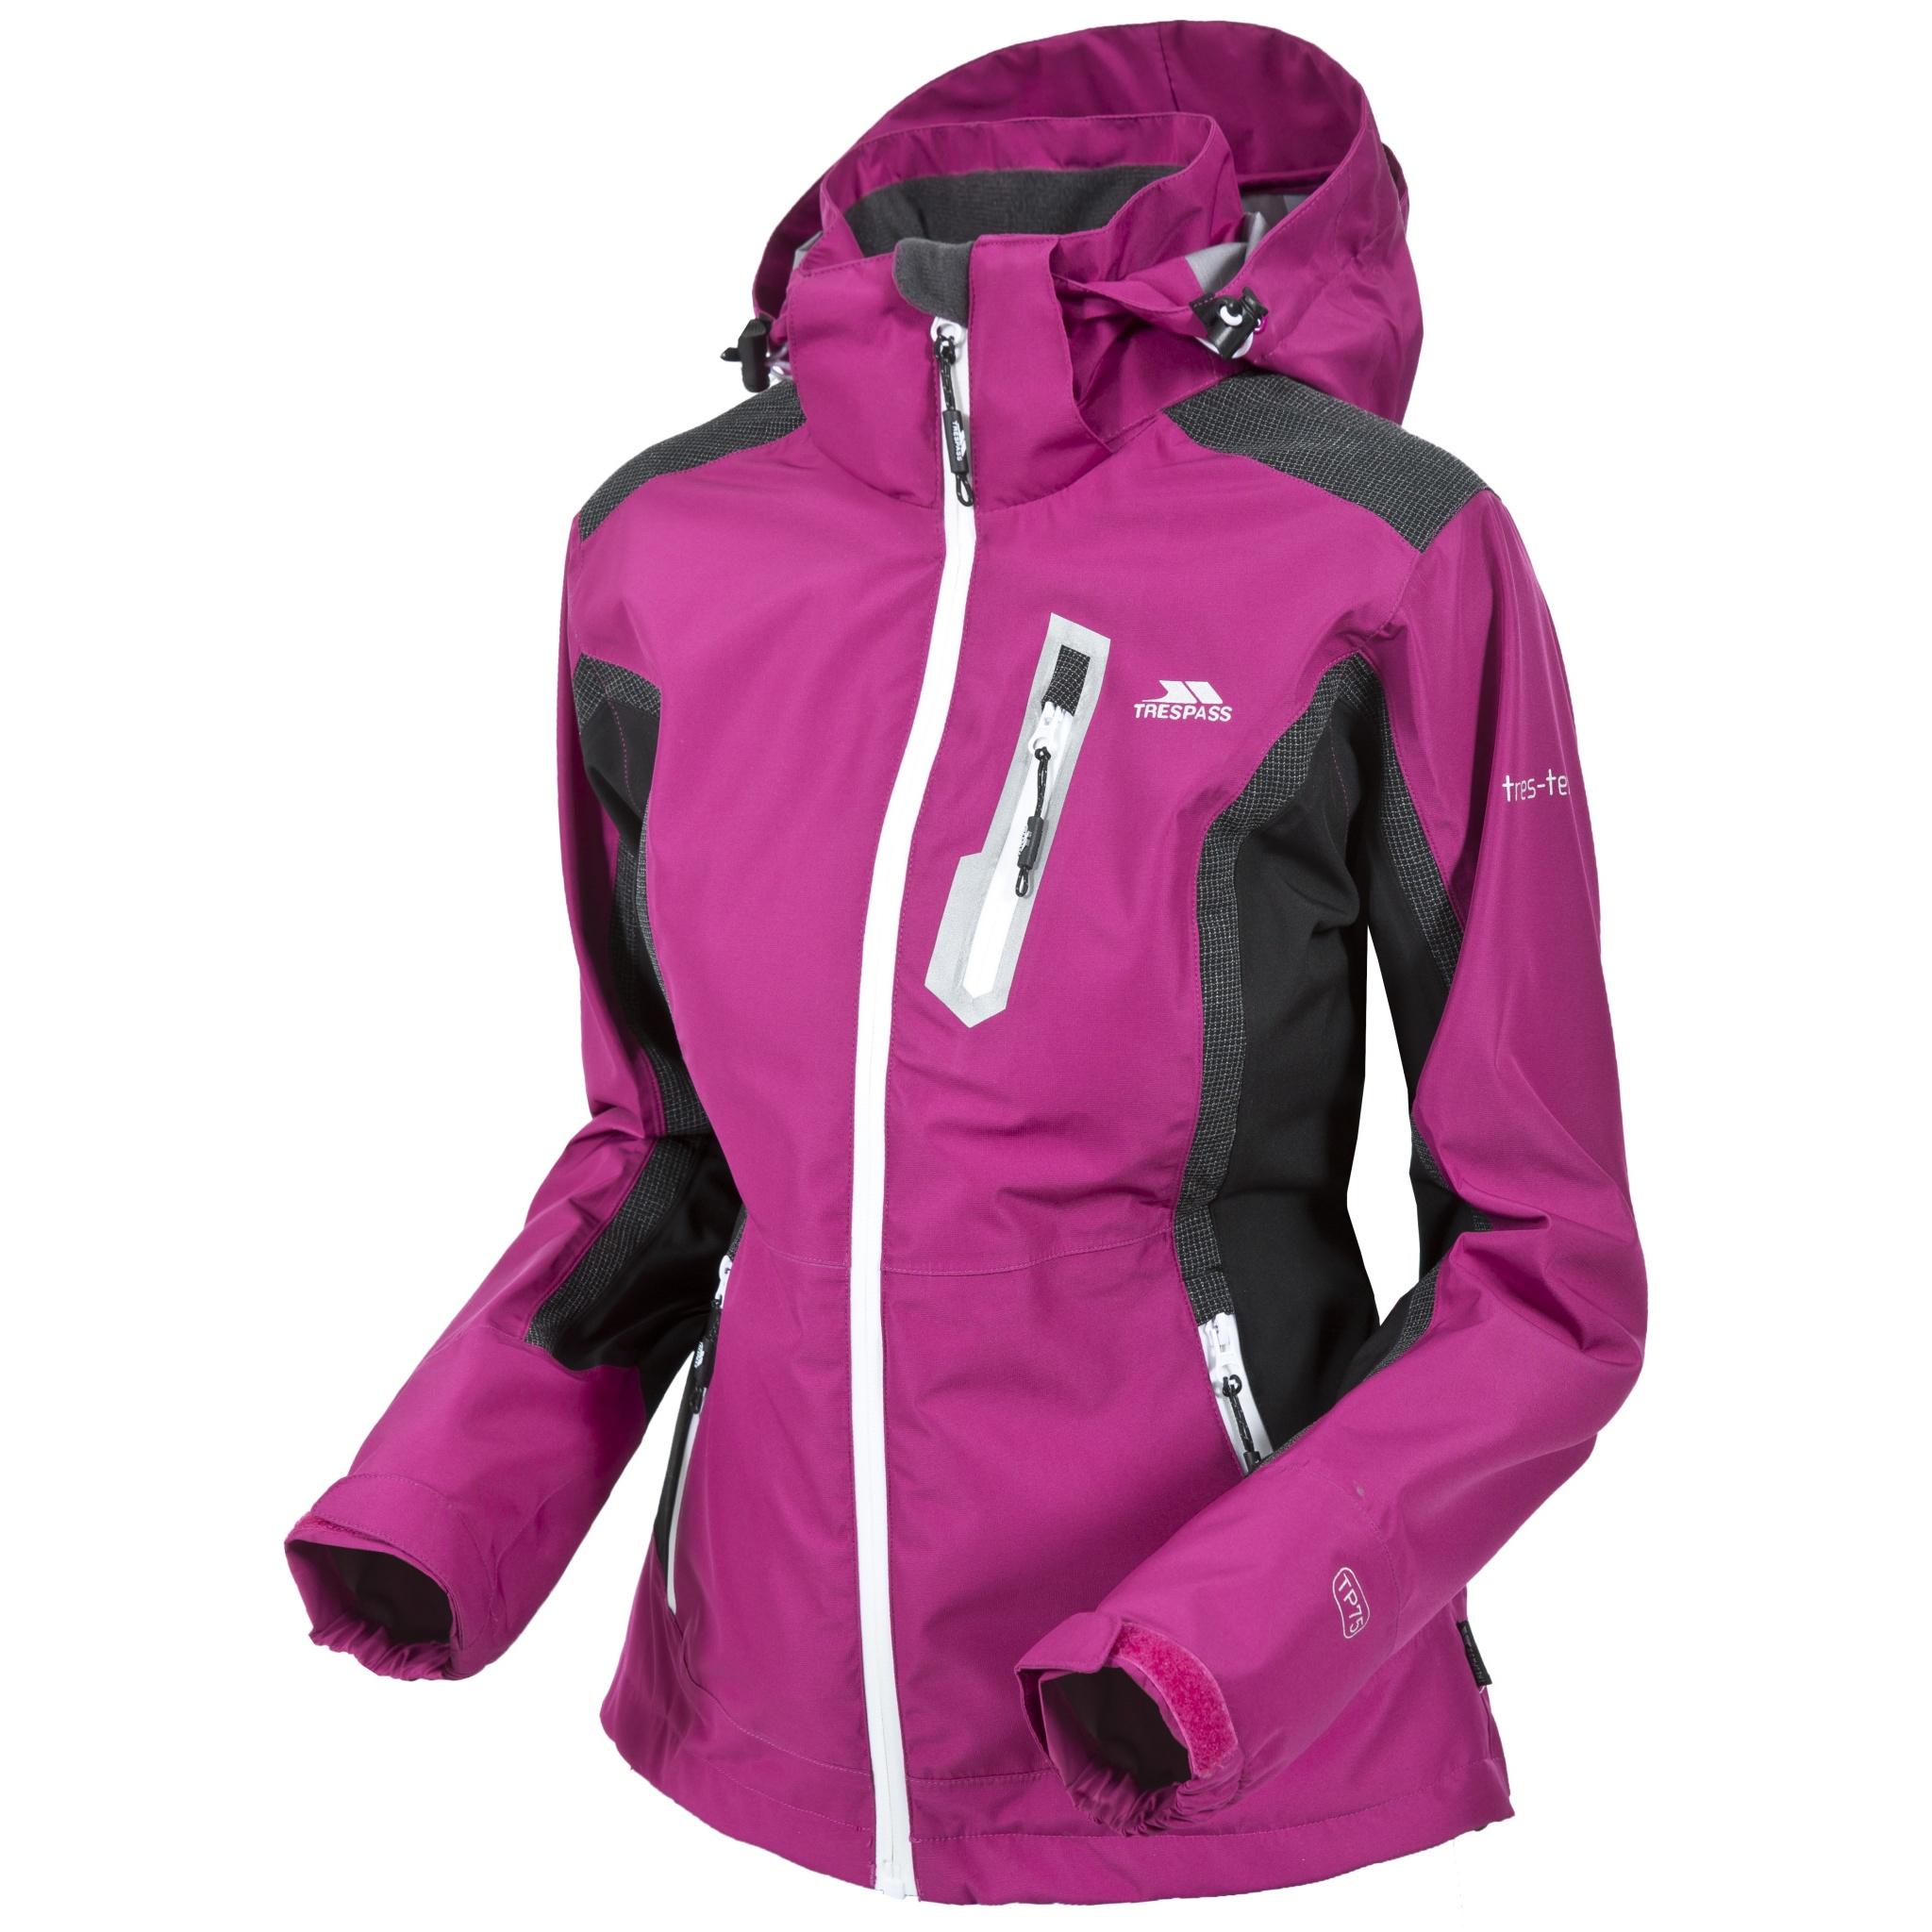 Trespass Womens/Ladies Amara Waterproof Outdoor Jacket With Detachable Hood (M) (Azalea)